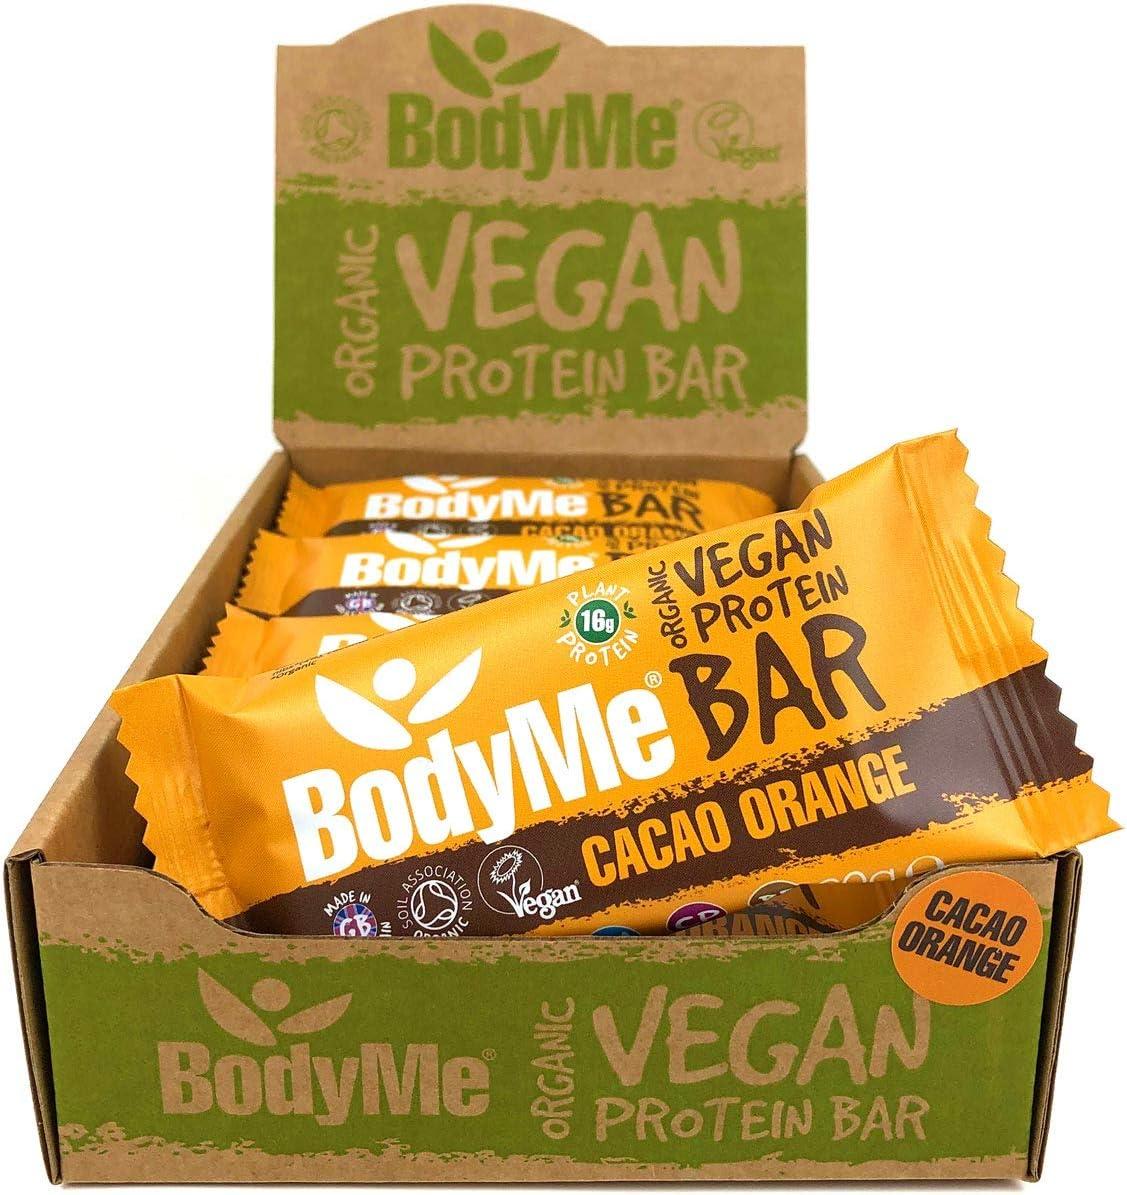 BodyMe Barritas Proteinas Veganas Organica | Crudo Cacao Naranja | 12 x 60g Barra Proteina Vegana | Sin Gluten | 16g Proteína Completa | 3 Proteina ...